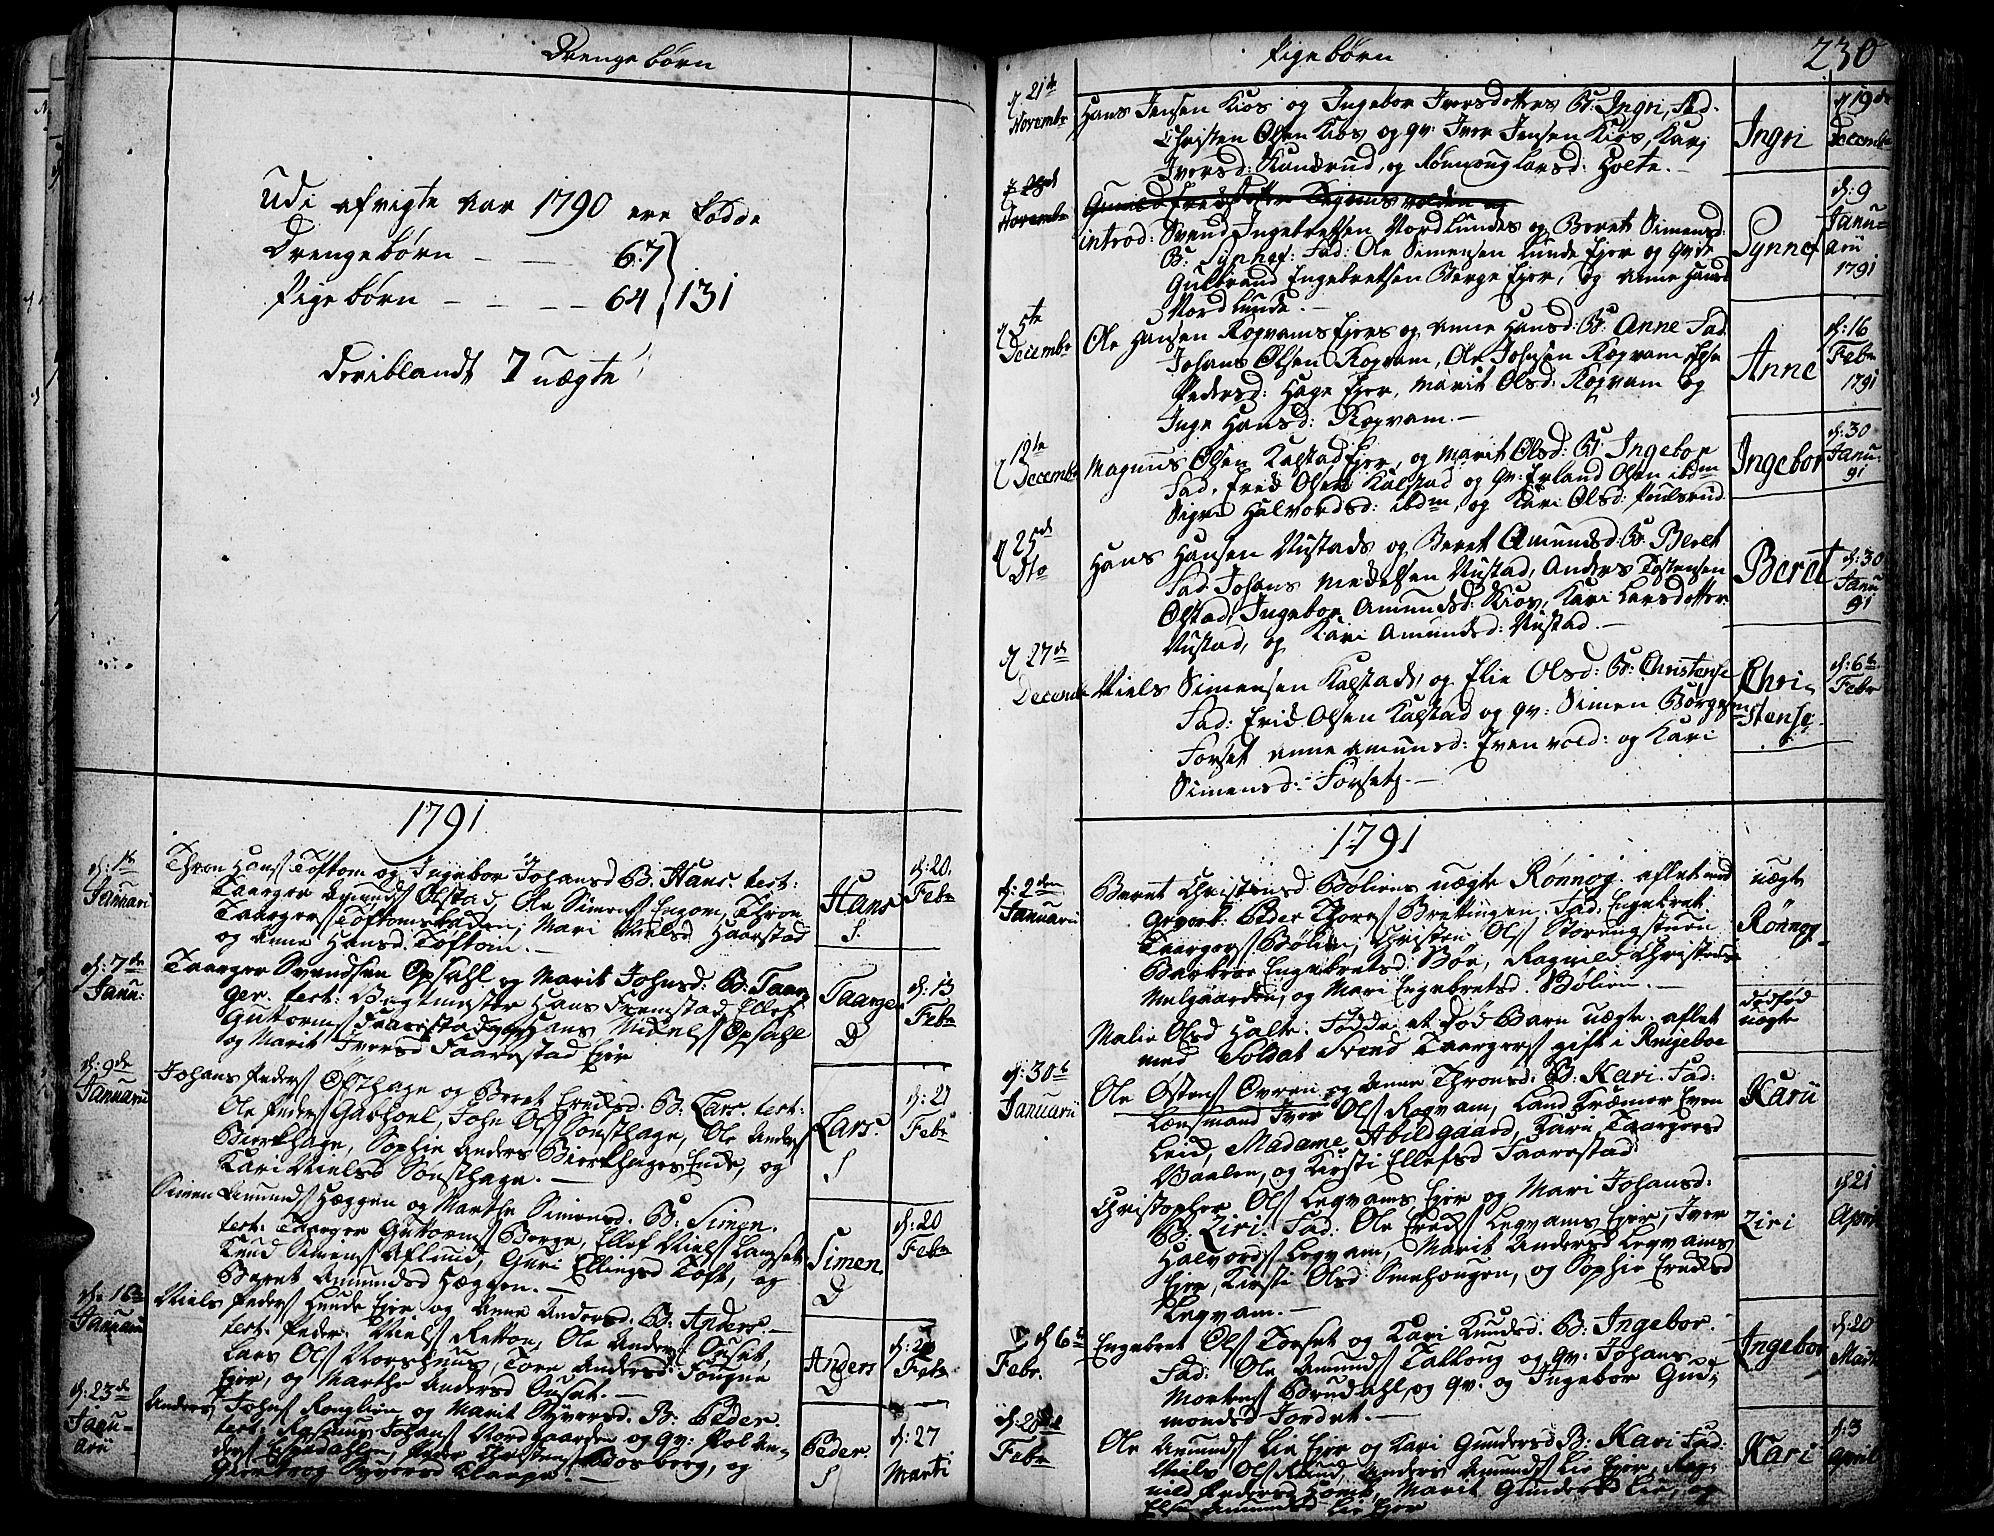 SAH, Gausdal prestekontor, Ministerialbok nr. 3, 1758-1809, s. 230